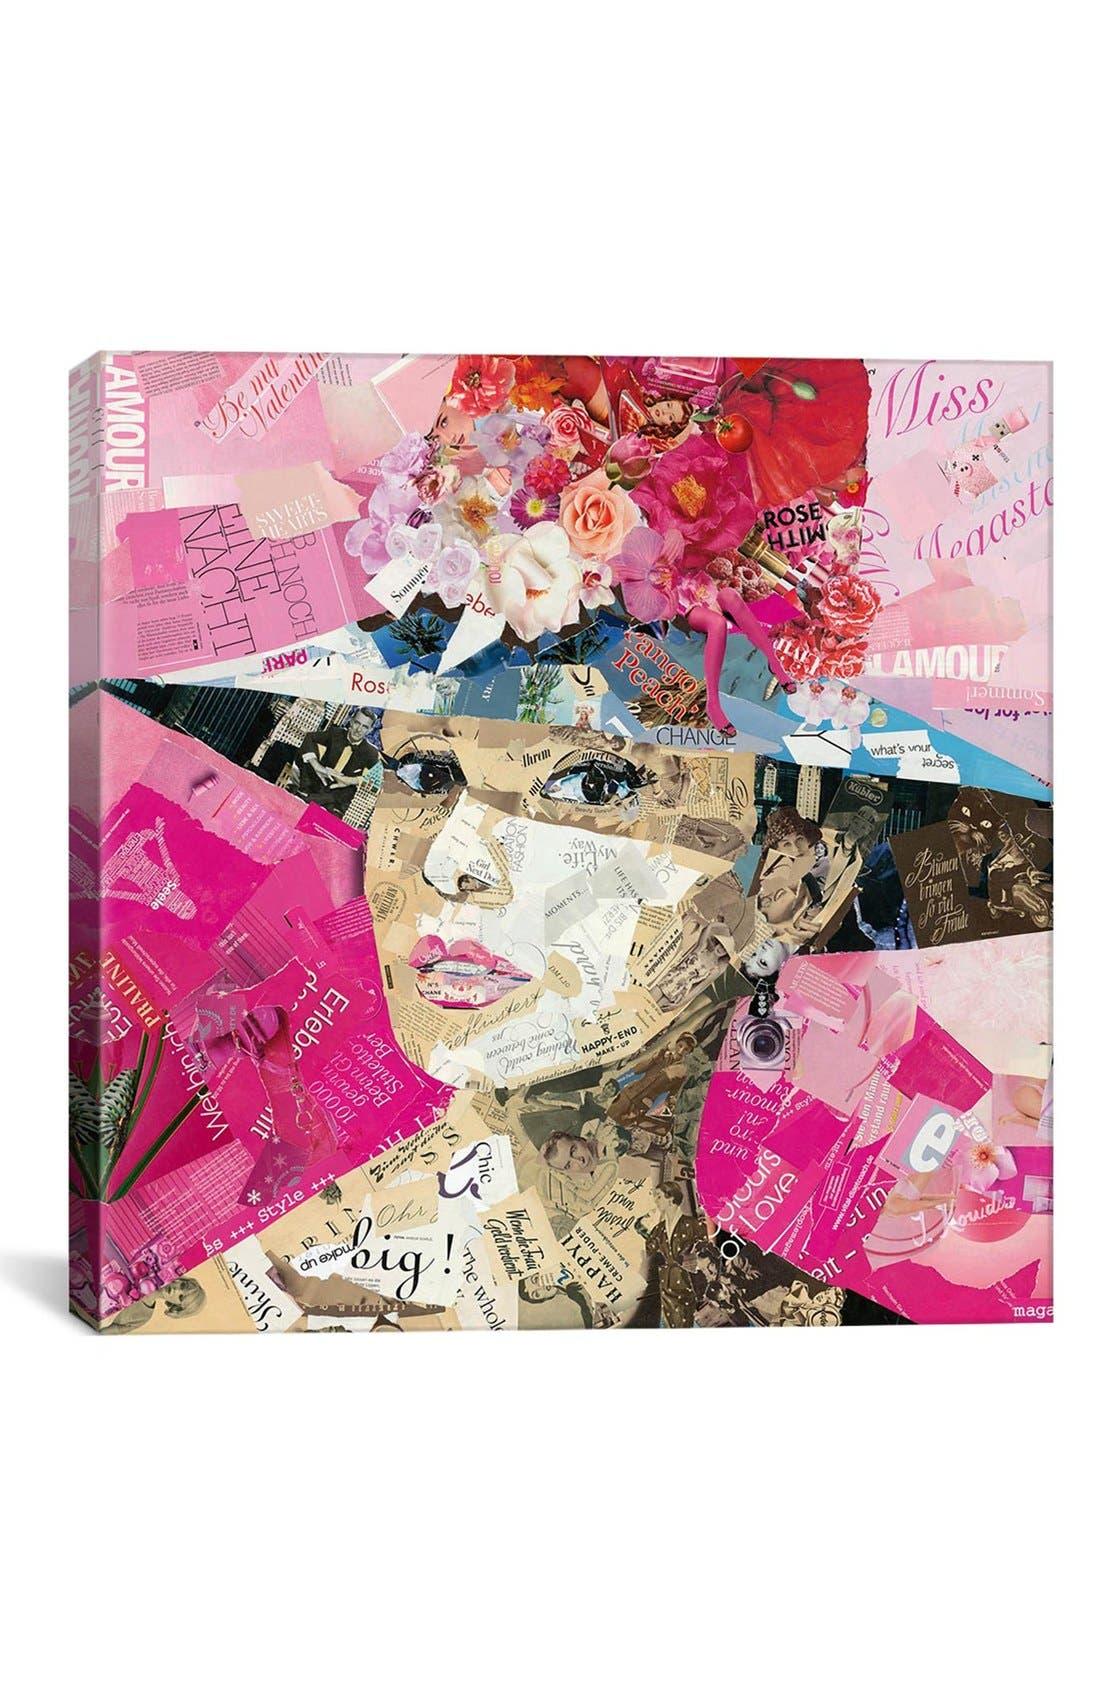 Alternate Image 1 Selected - iCanvas 'Girl Next Door - Ines Kouidis' Giclée Print Canvas Art